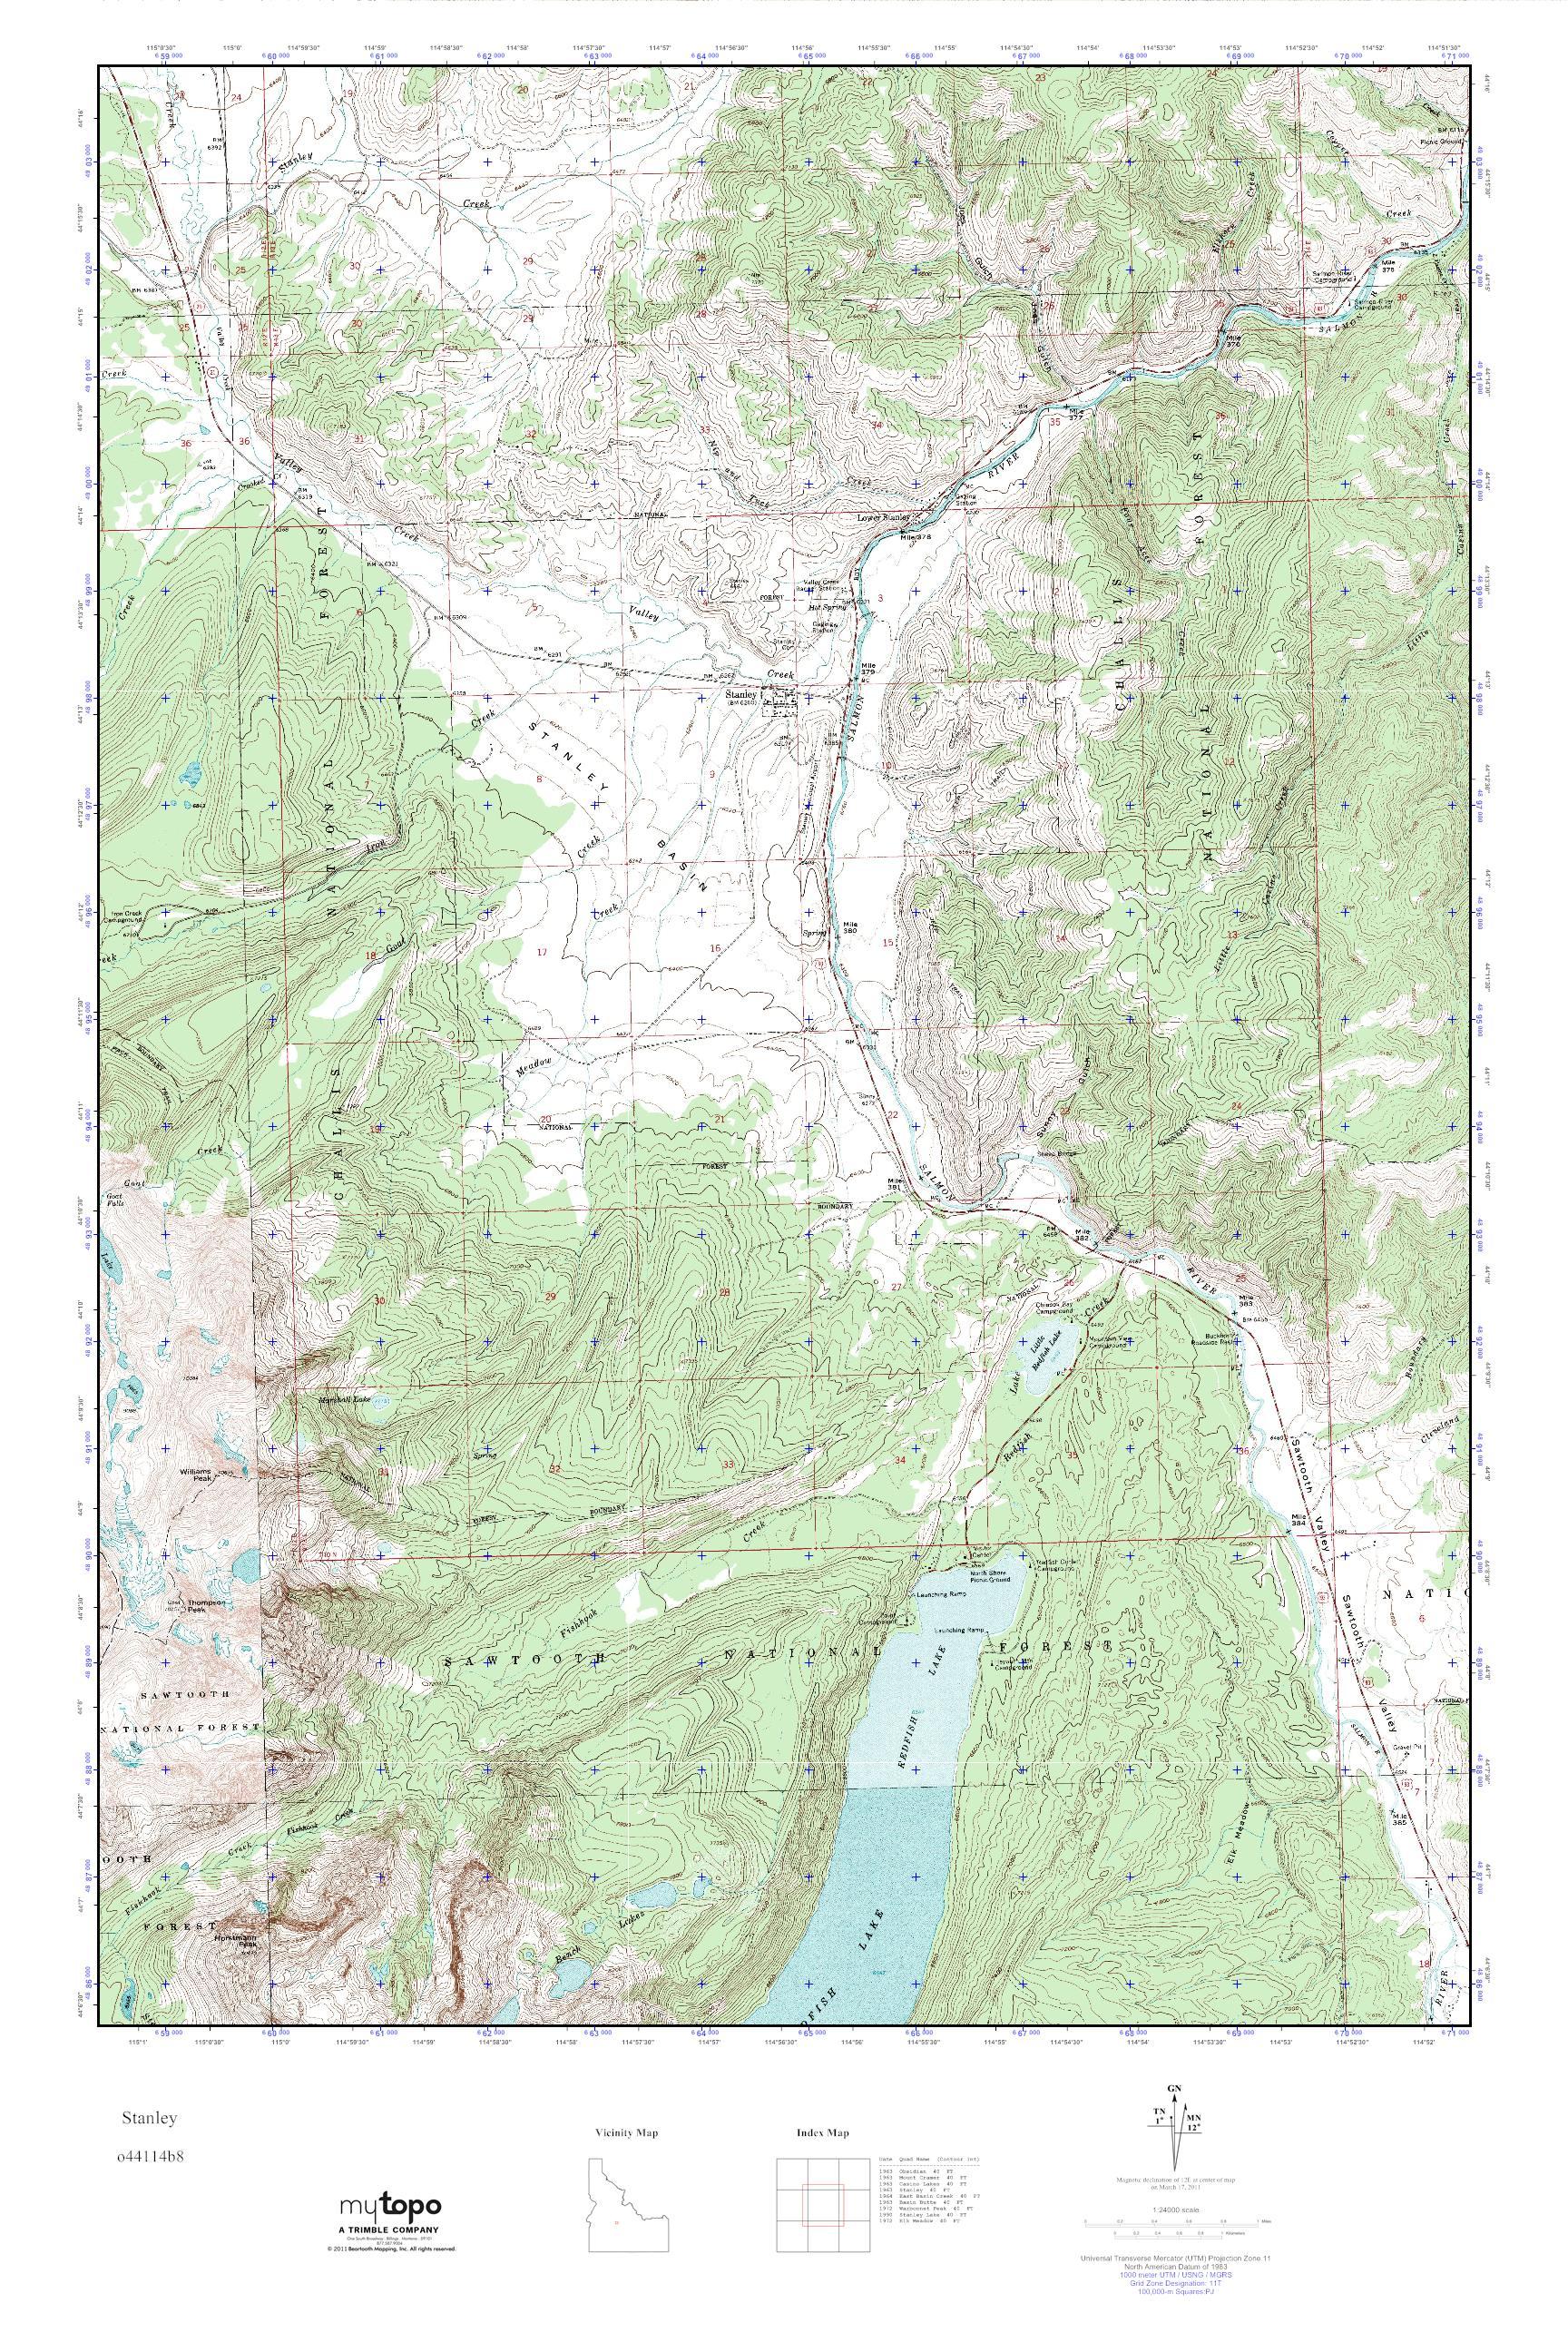 MyTopo Stanley, Idaho USGS Quad Topo Map